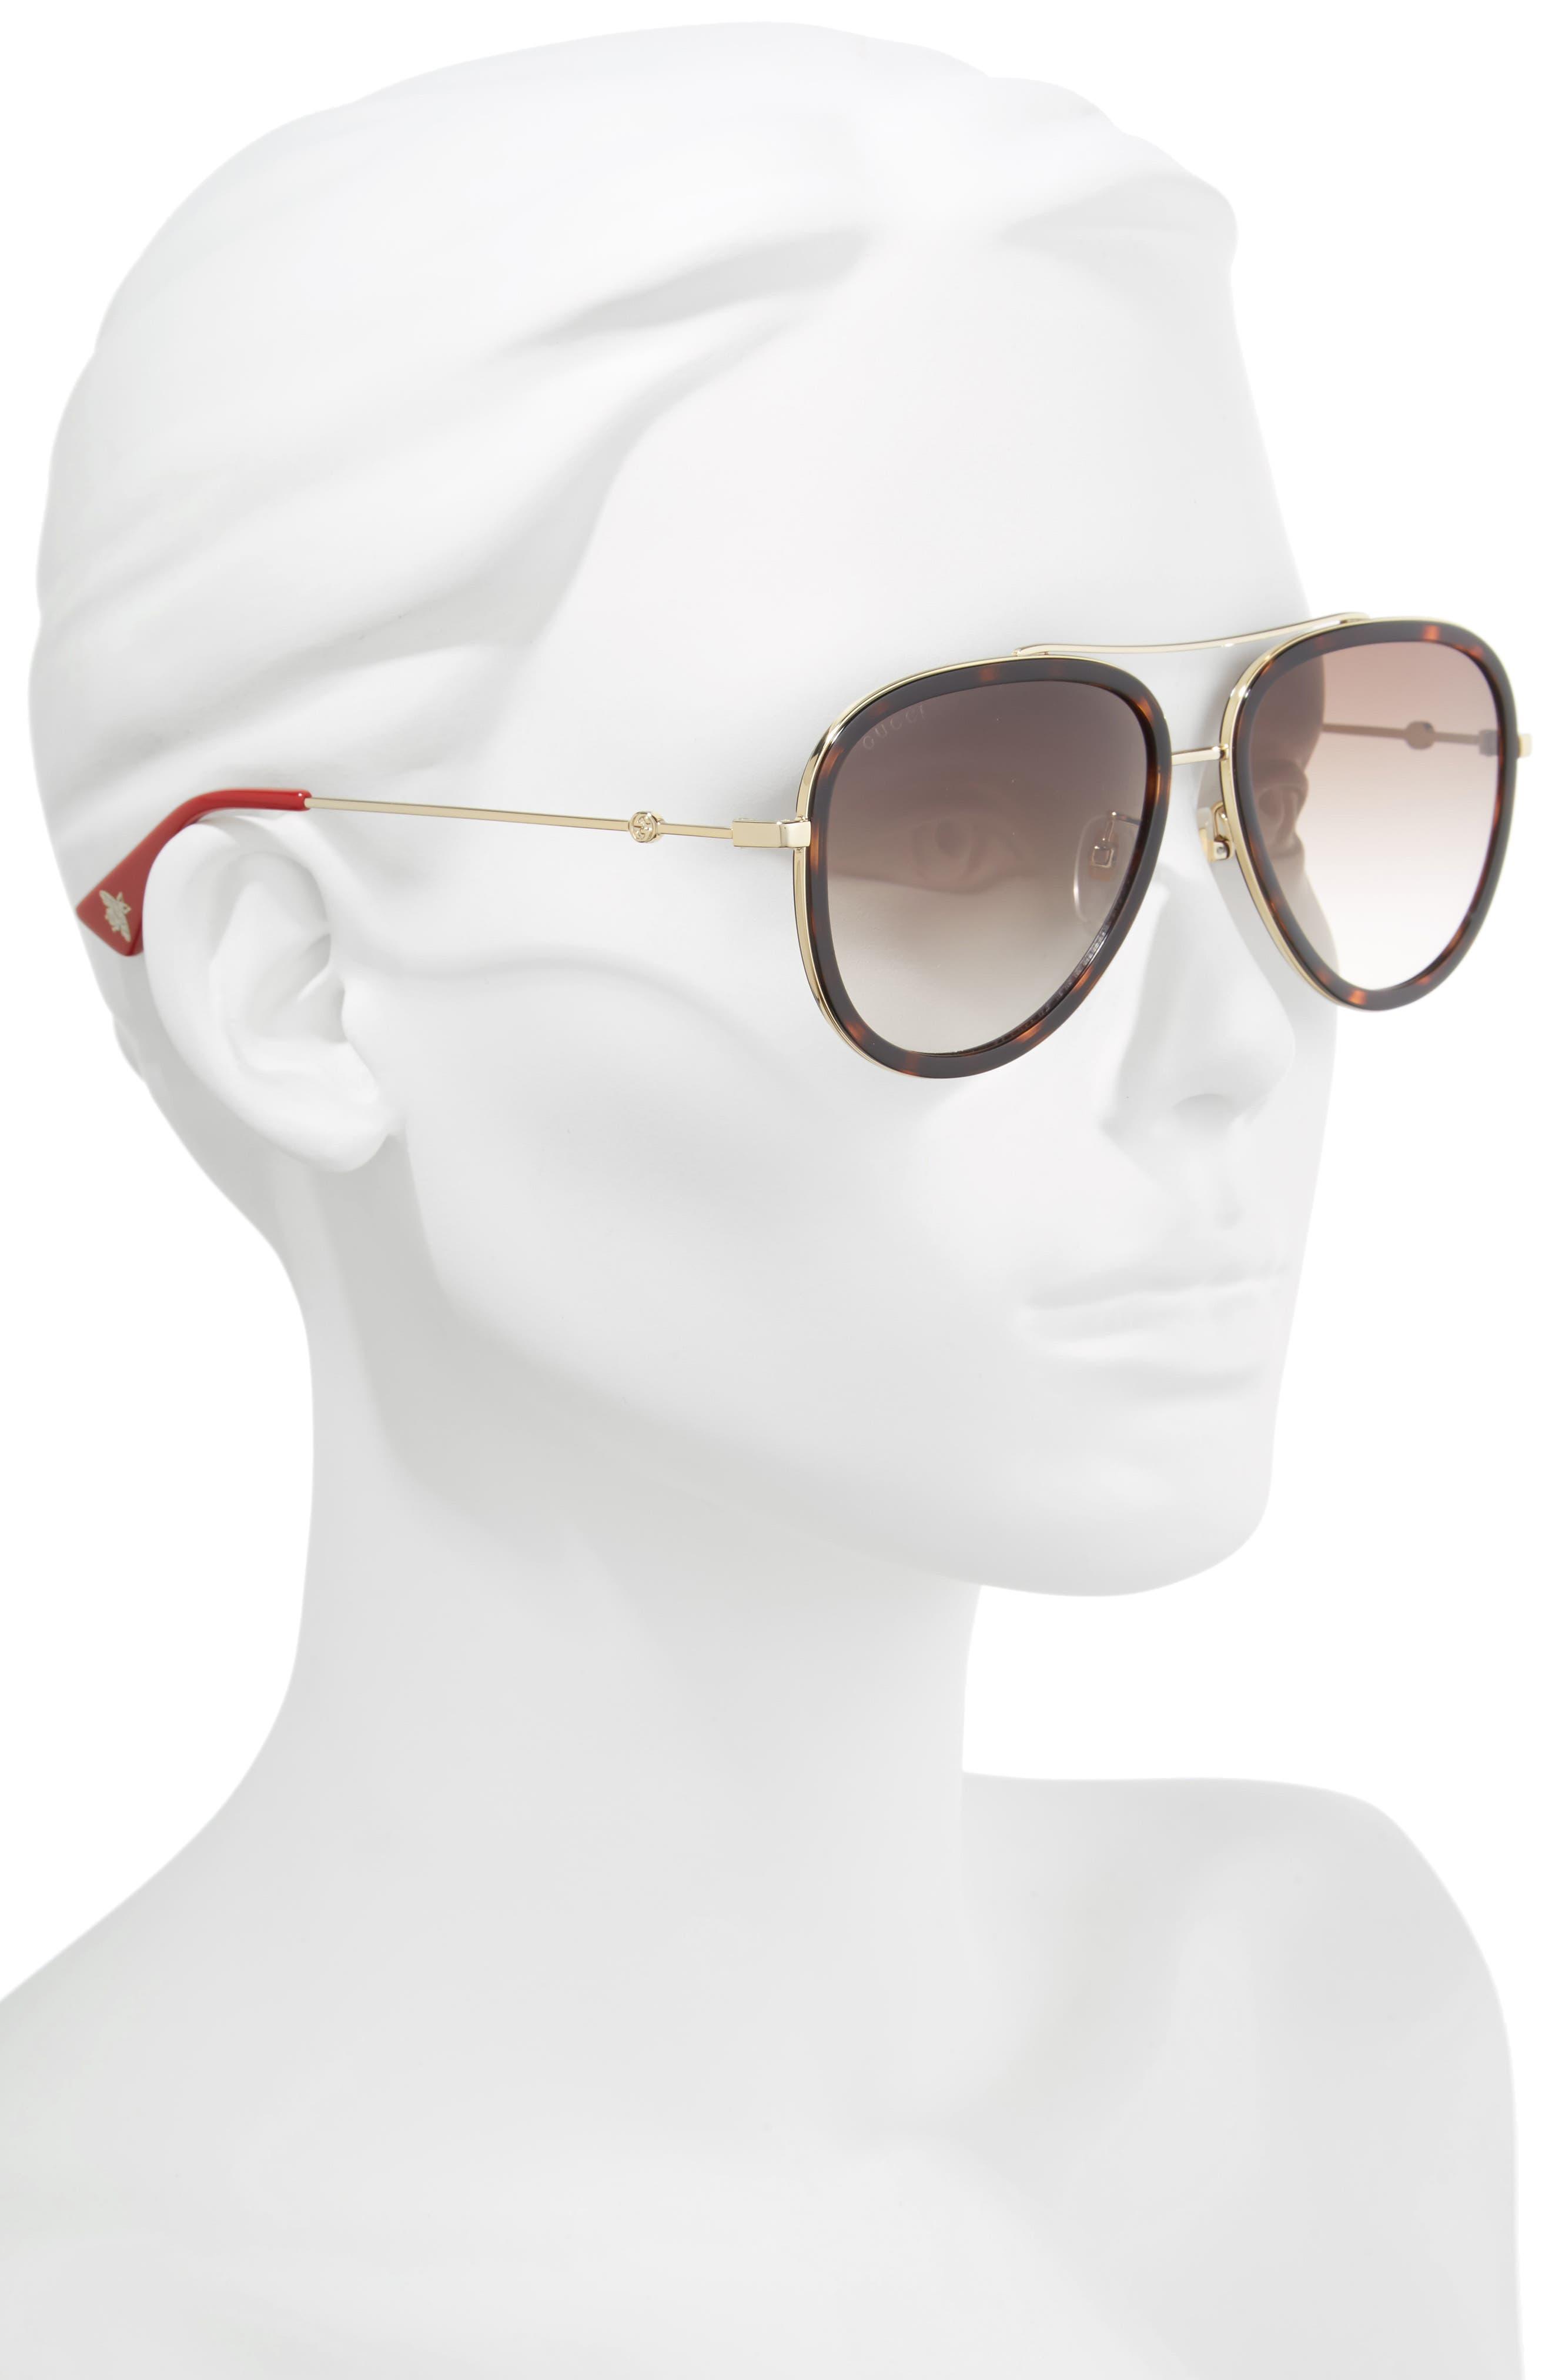 57mm Aviator Sunglasses,                             Alternate thumbnail 2, color,                             GOLD/ RED/ GREEN